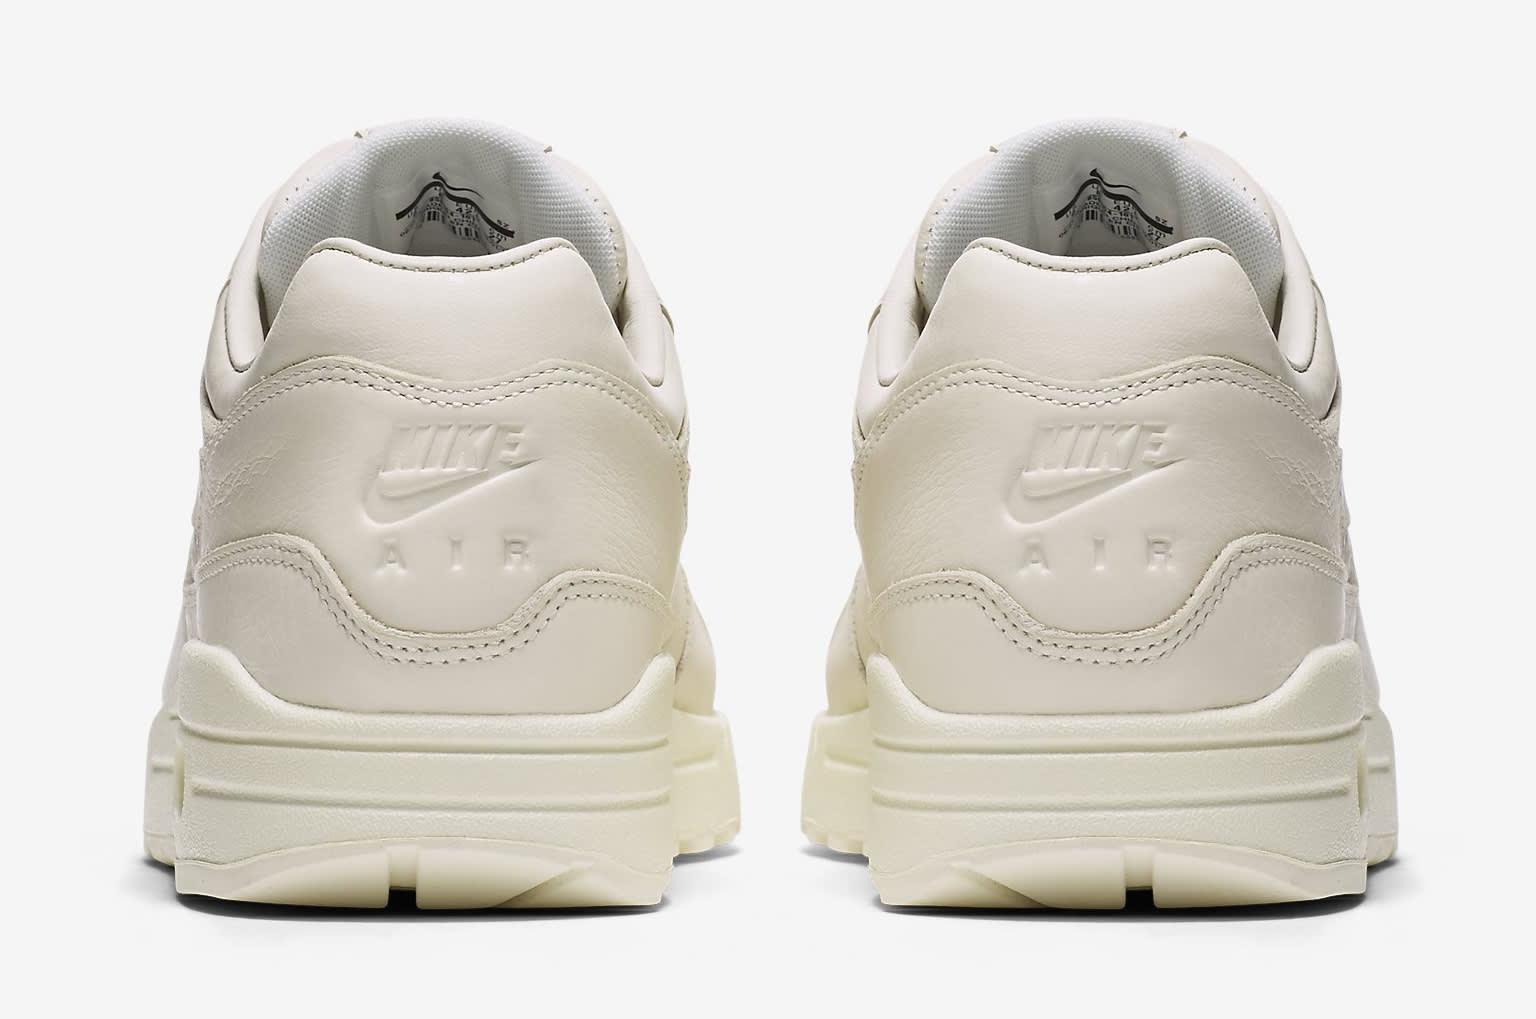 competitive price f9fd2 df0cd Image via Nike Nike Air Max 1 Pinnacle Sail 859554-101 Heel